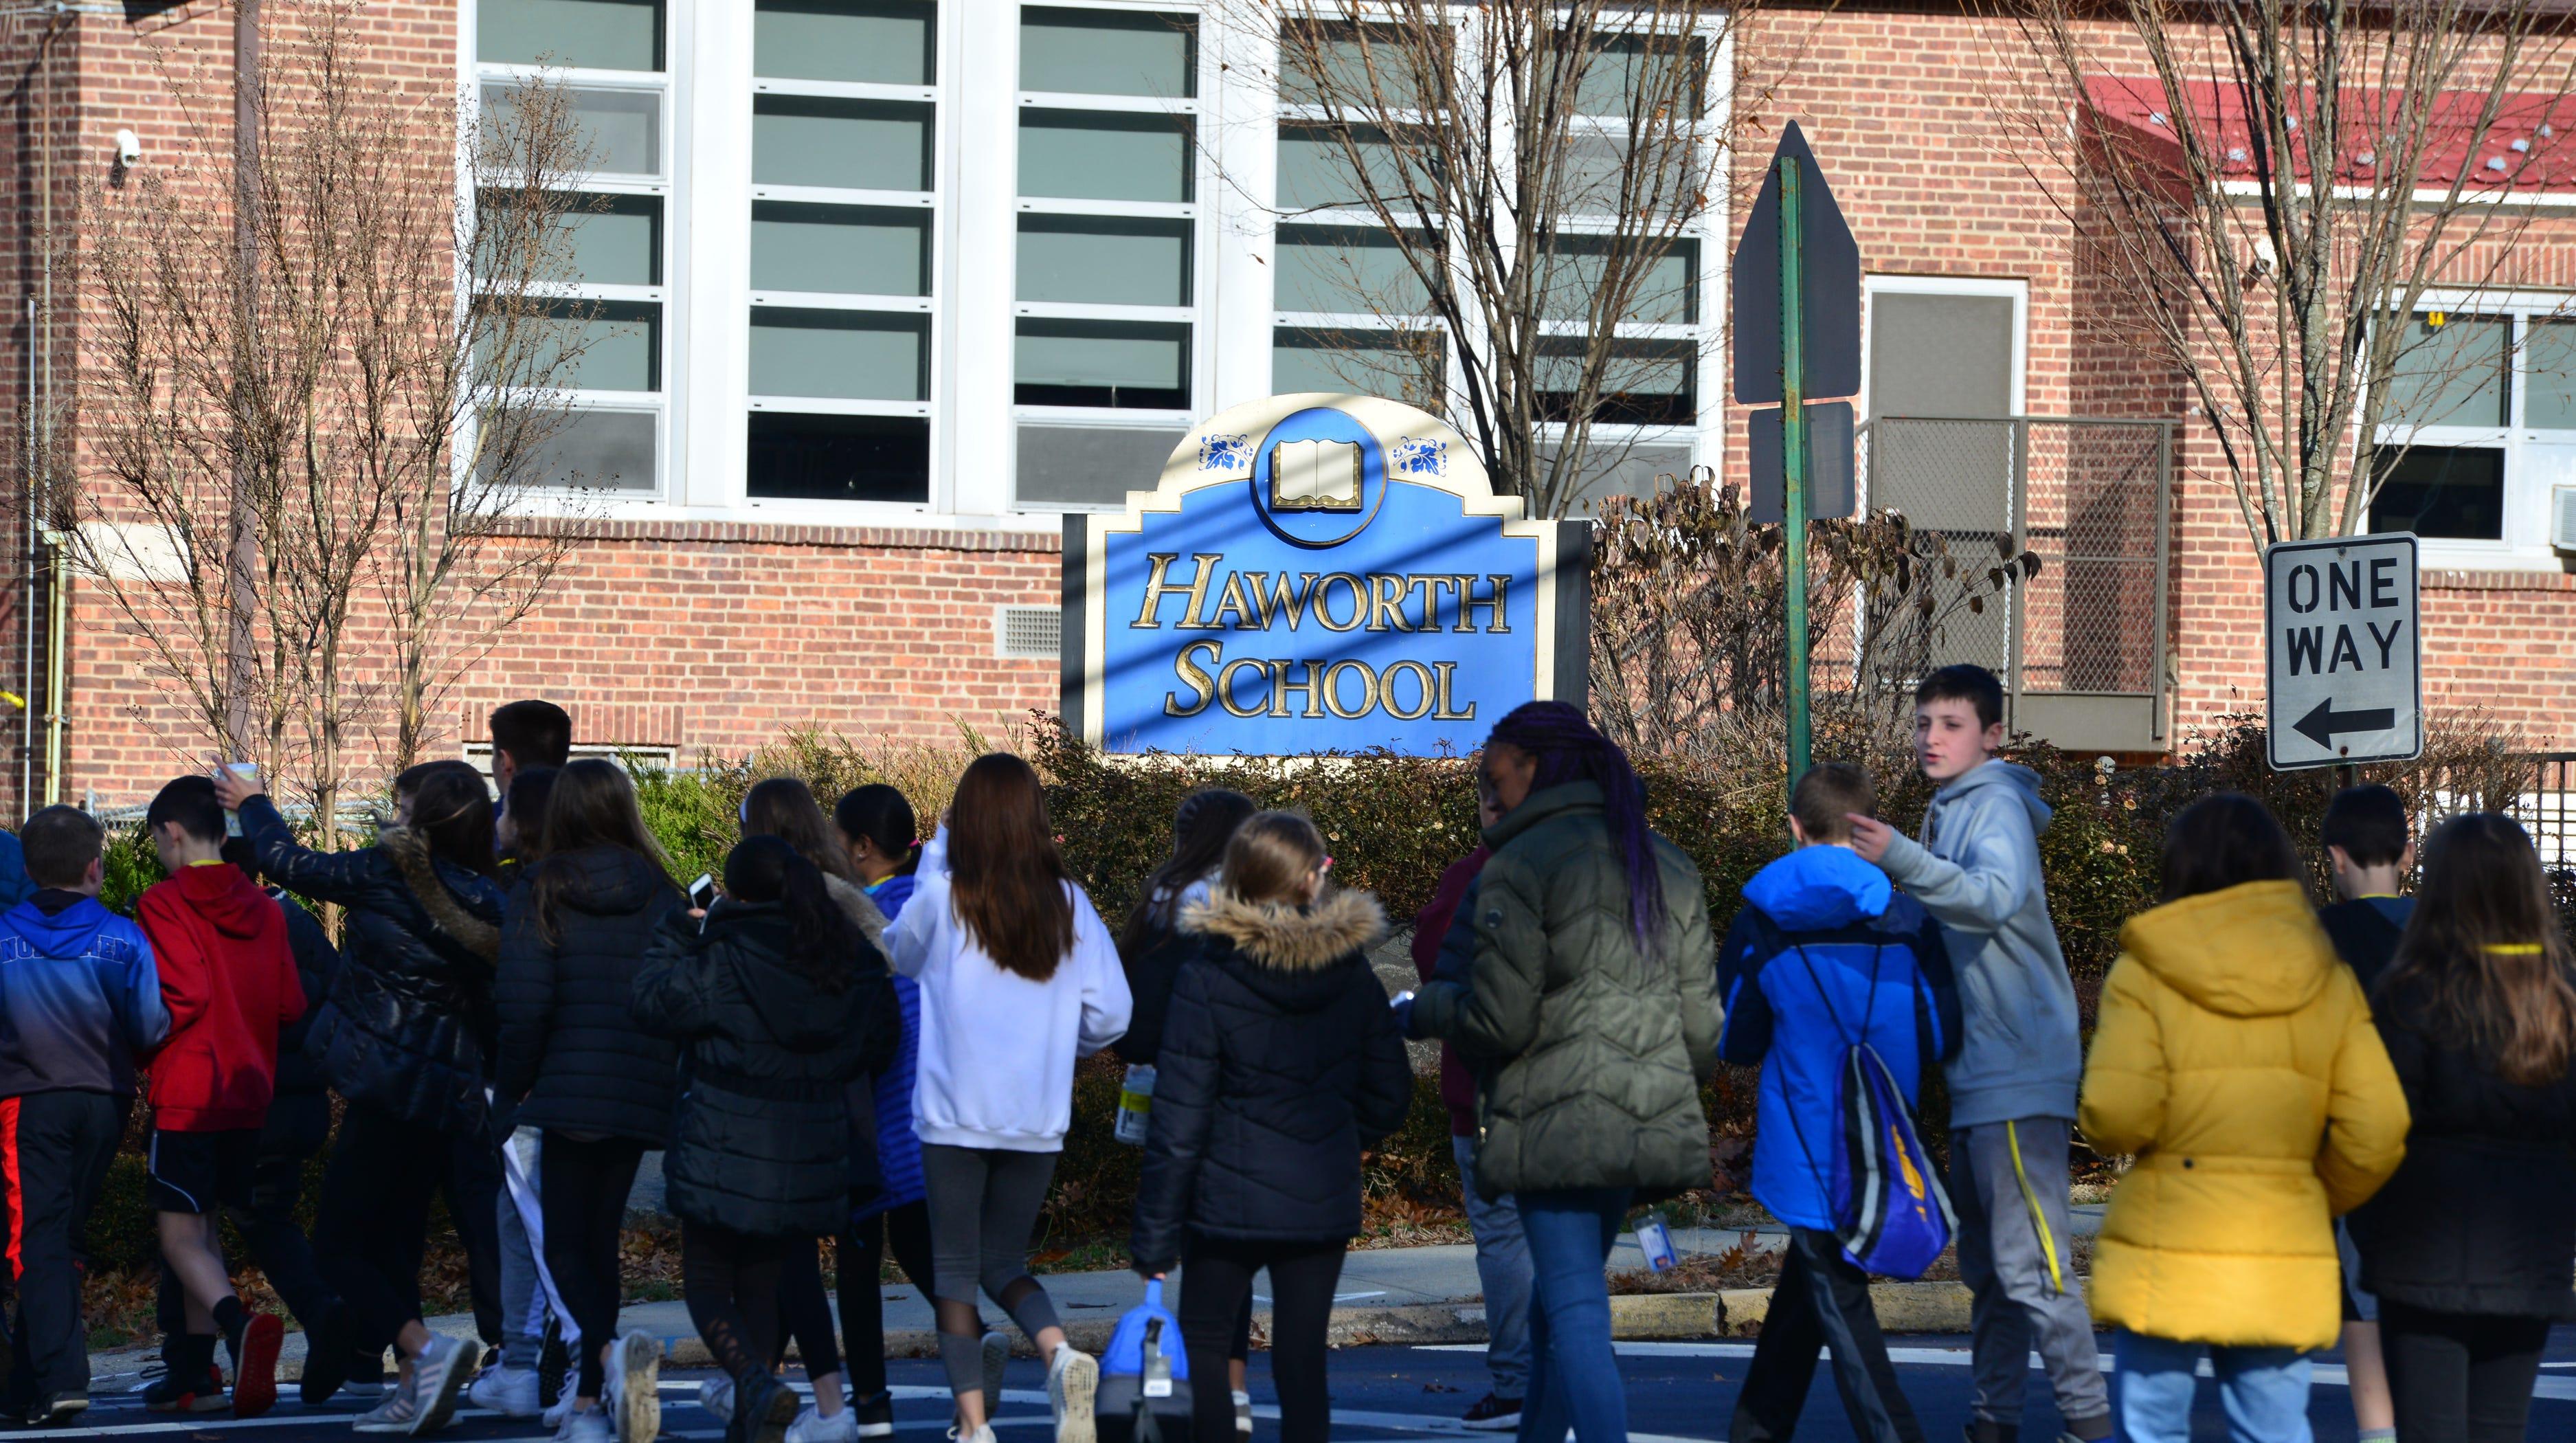 Report highlights traffic dangers around local schools